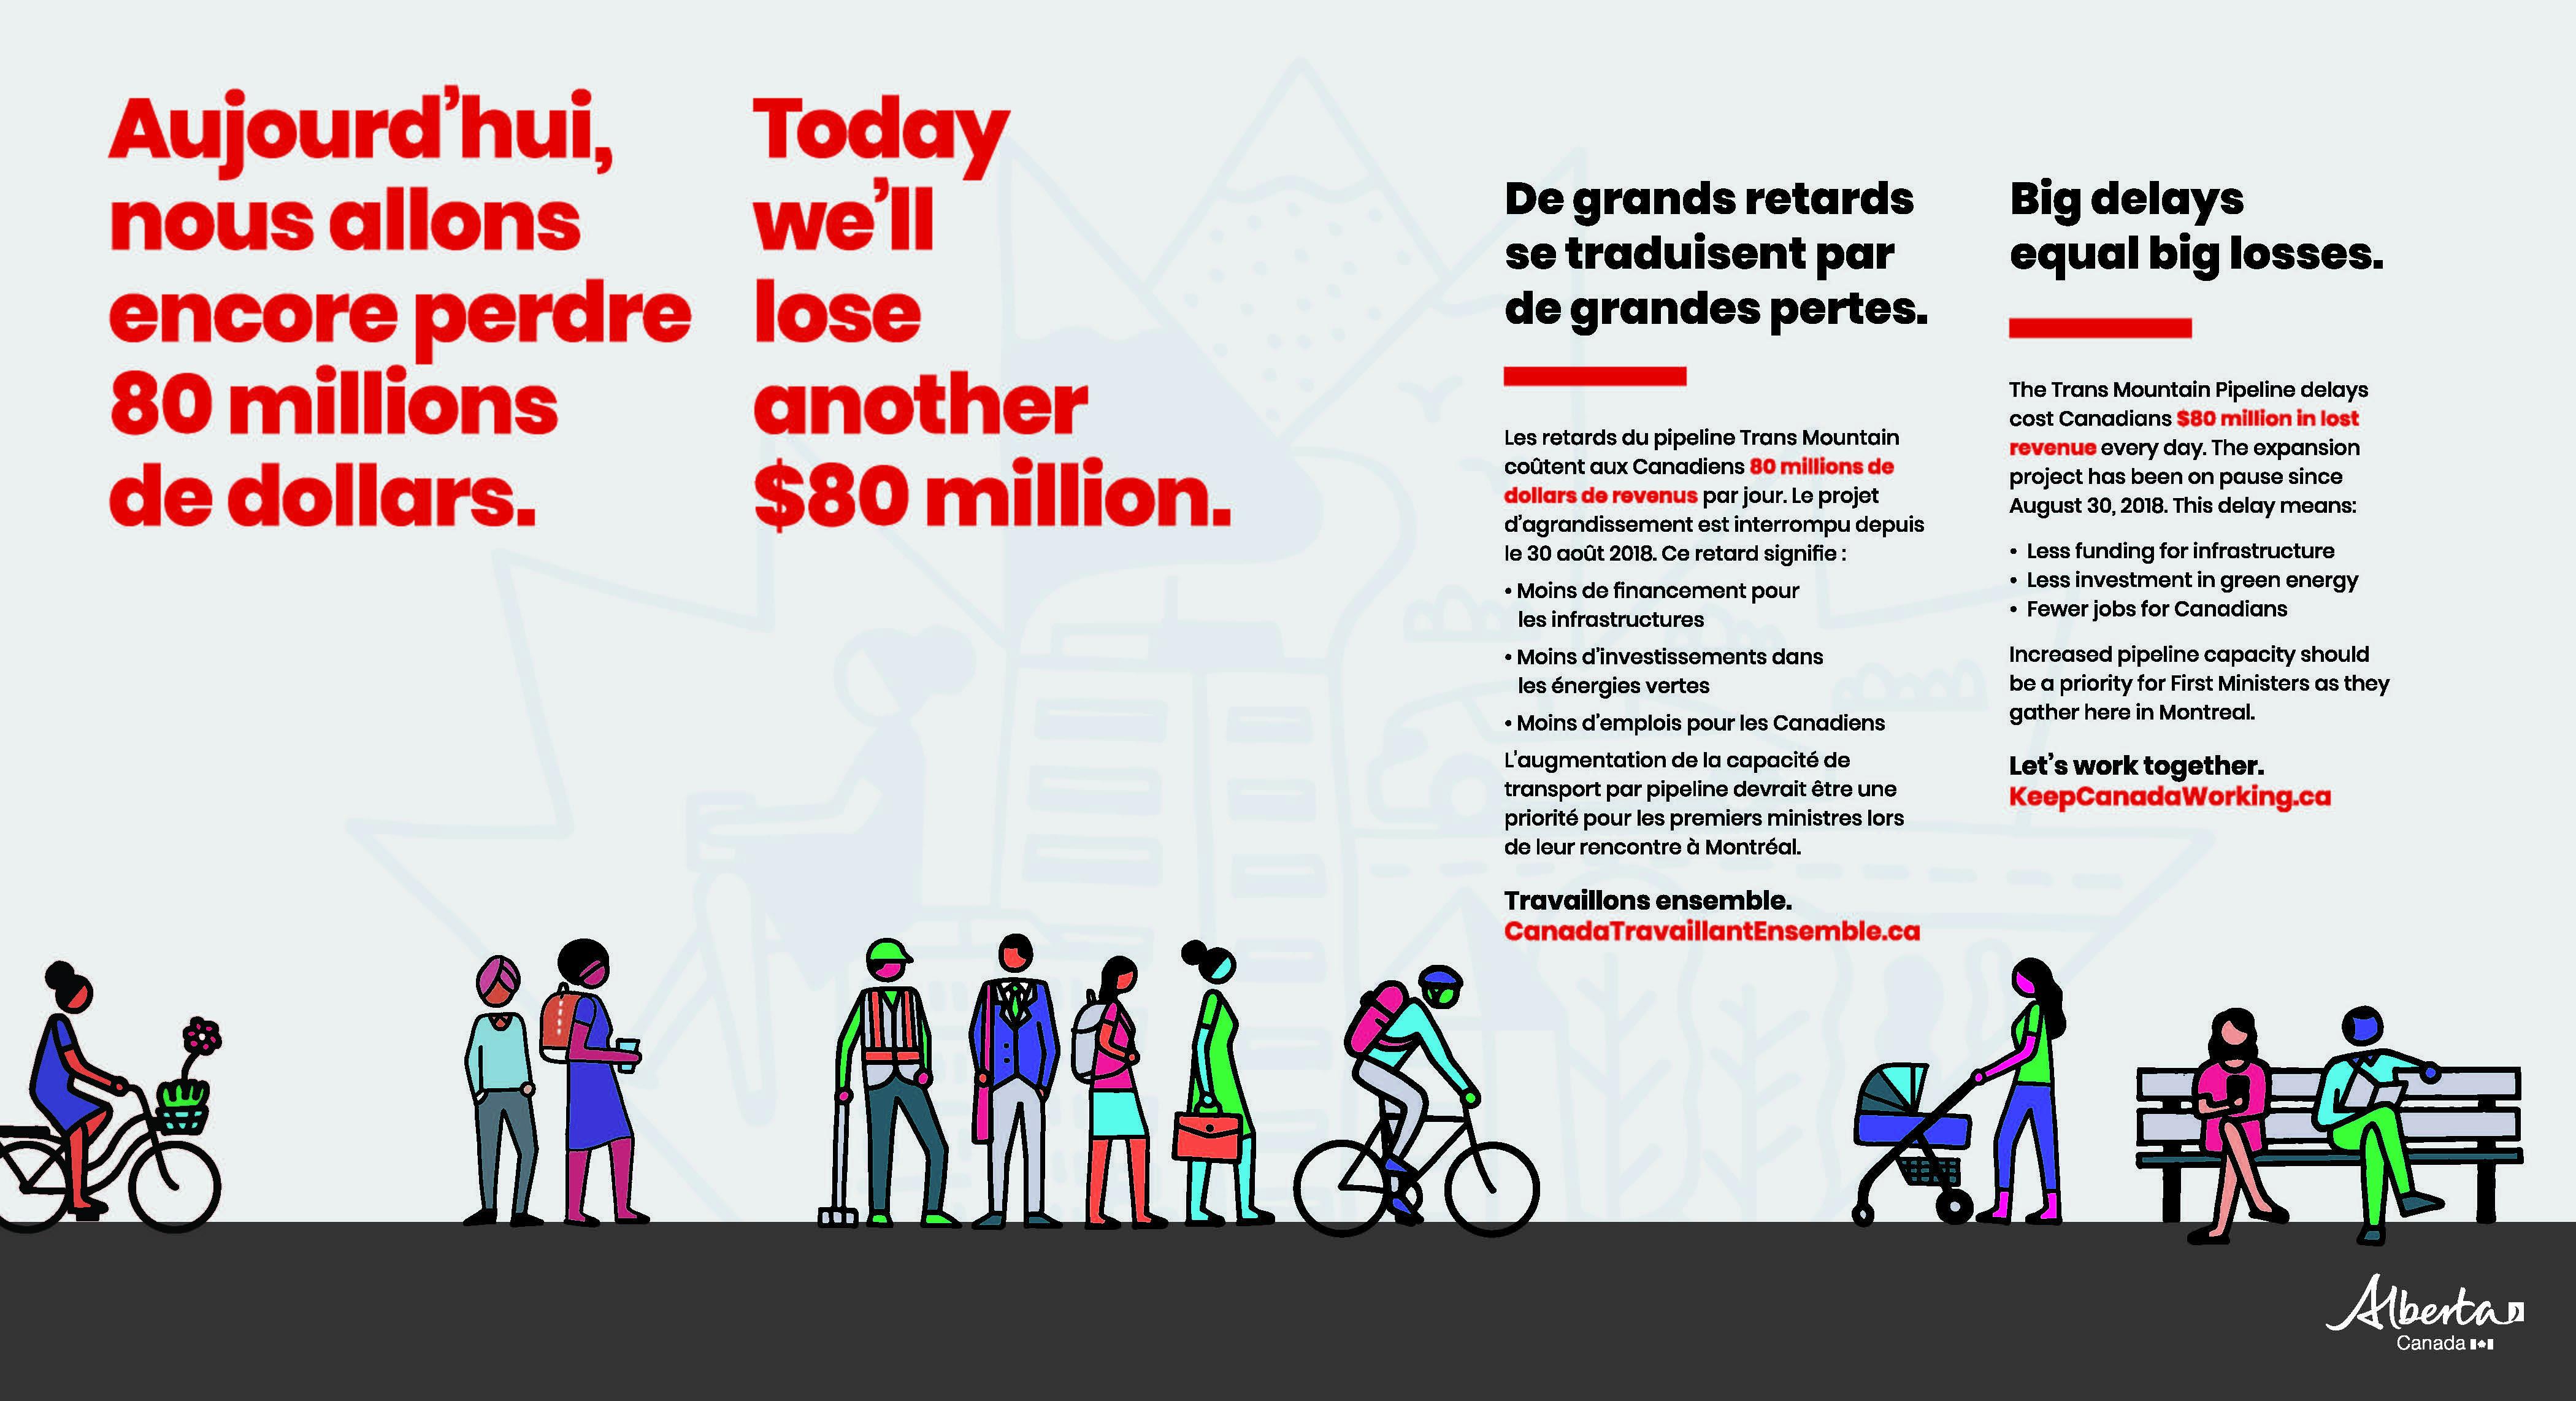 Montreal StarMetro ad